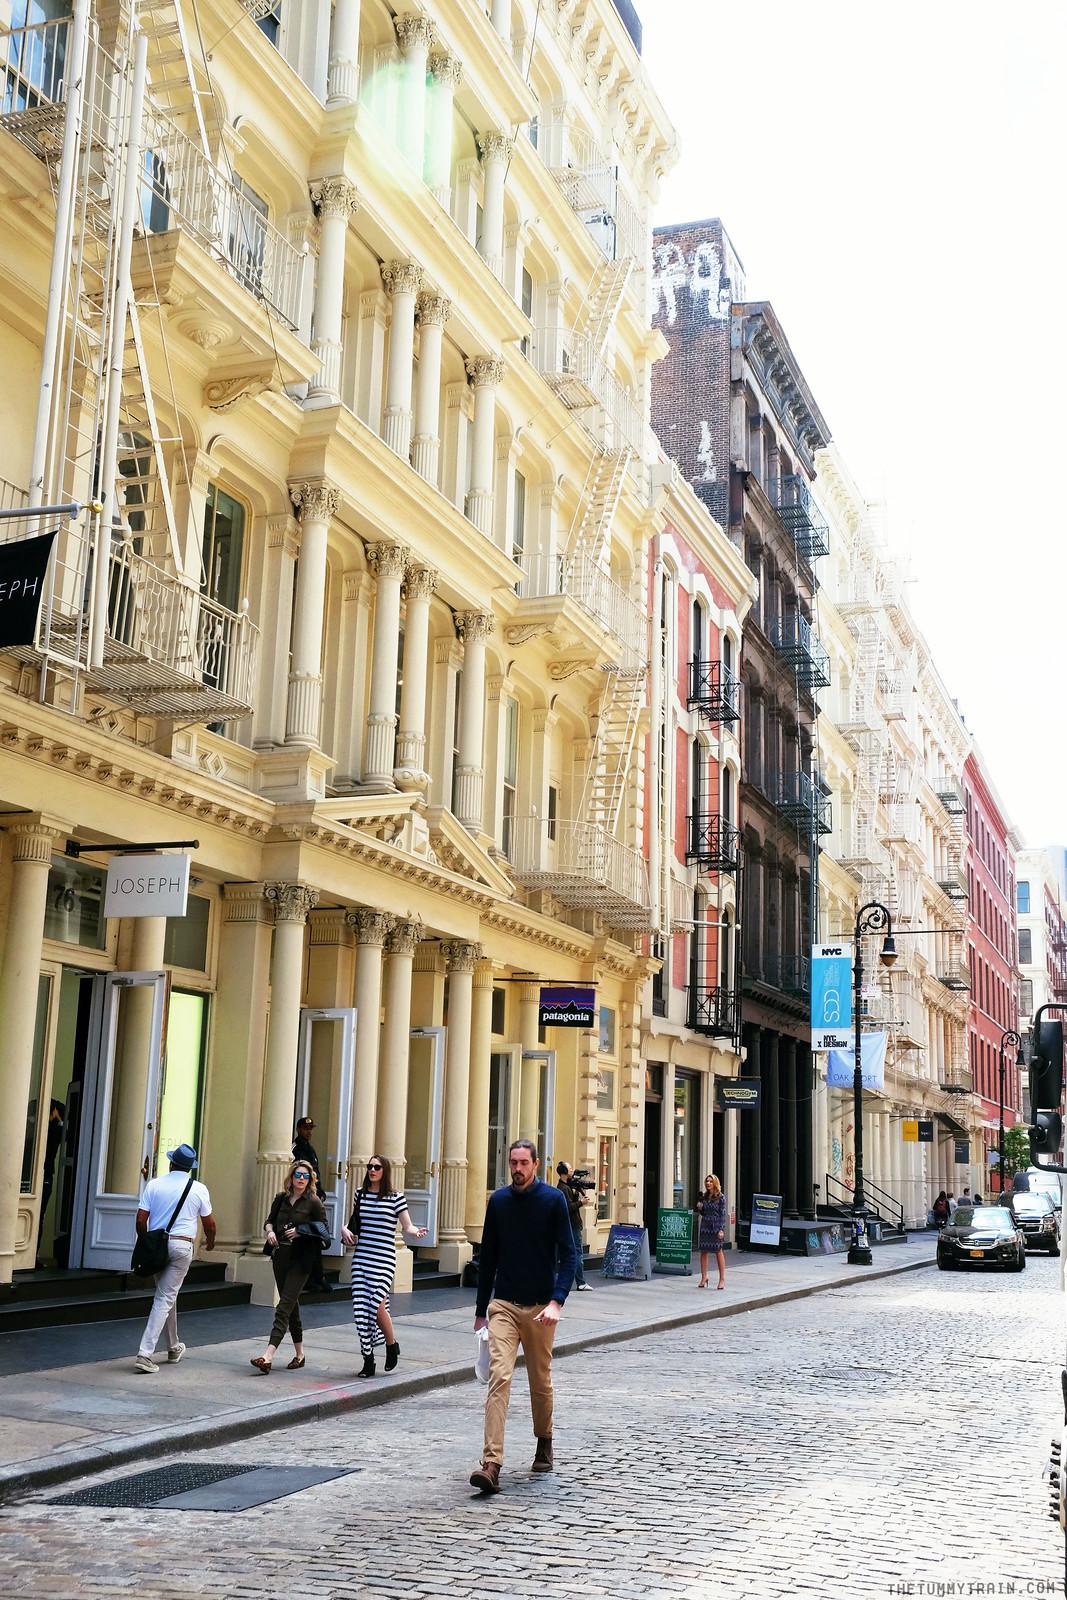 29550709554 ae35ff9679 h - USA 2016 Travel Diary: Walking through SoHo-Little Italy-Chinatown